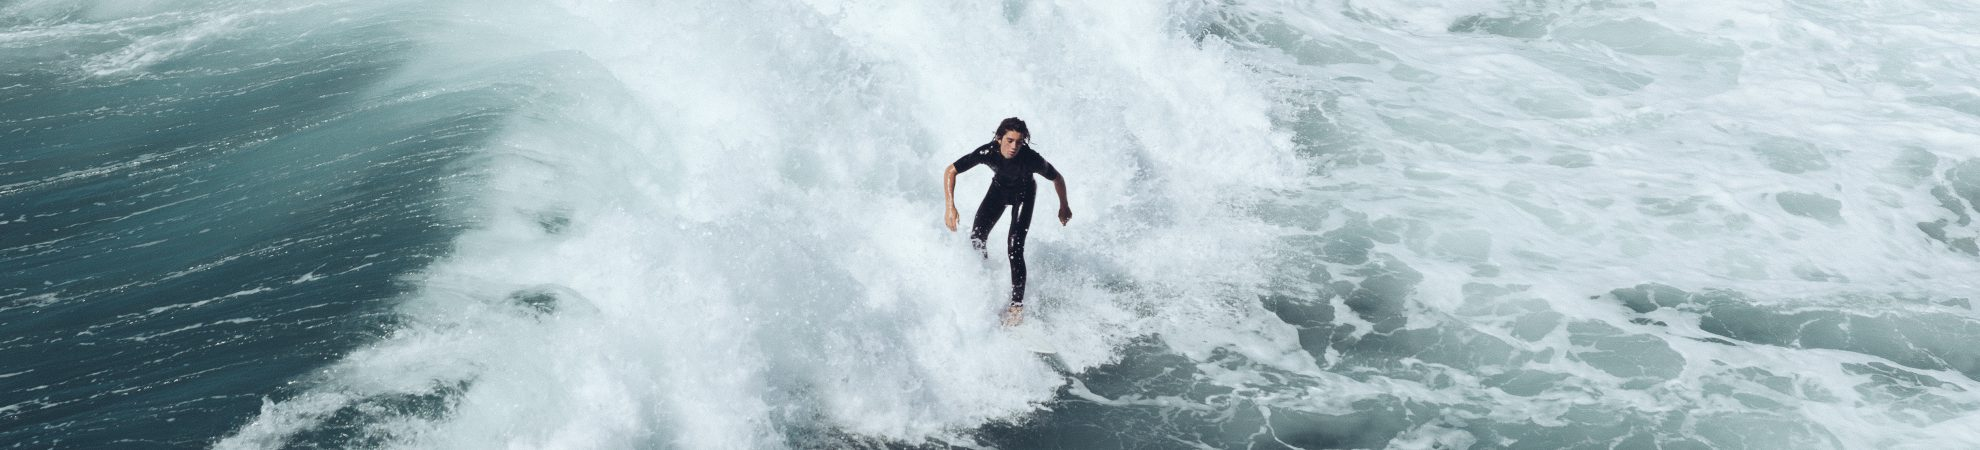 Benefits of Surfing